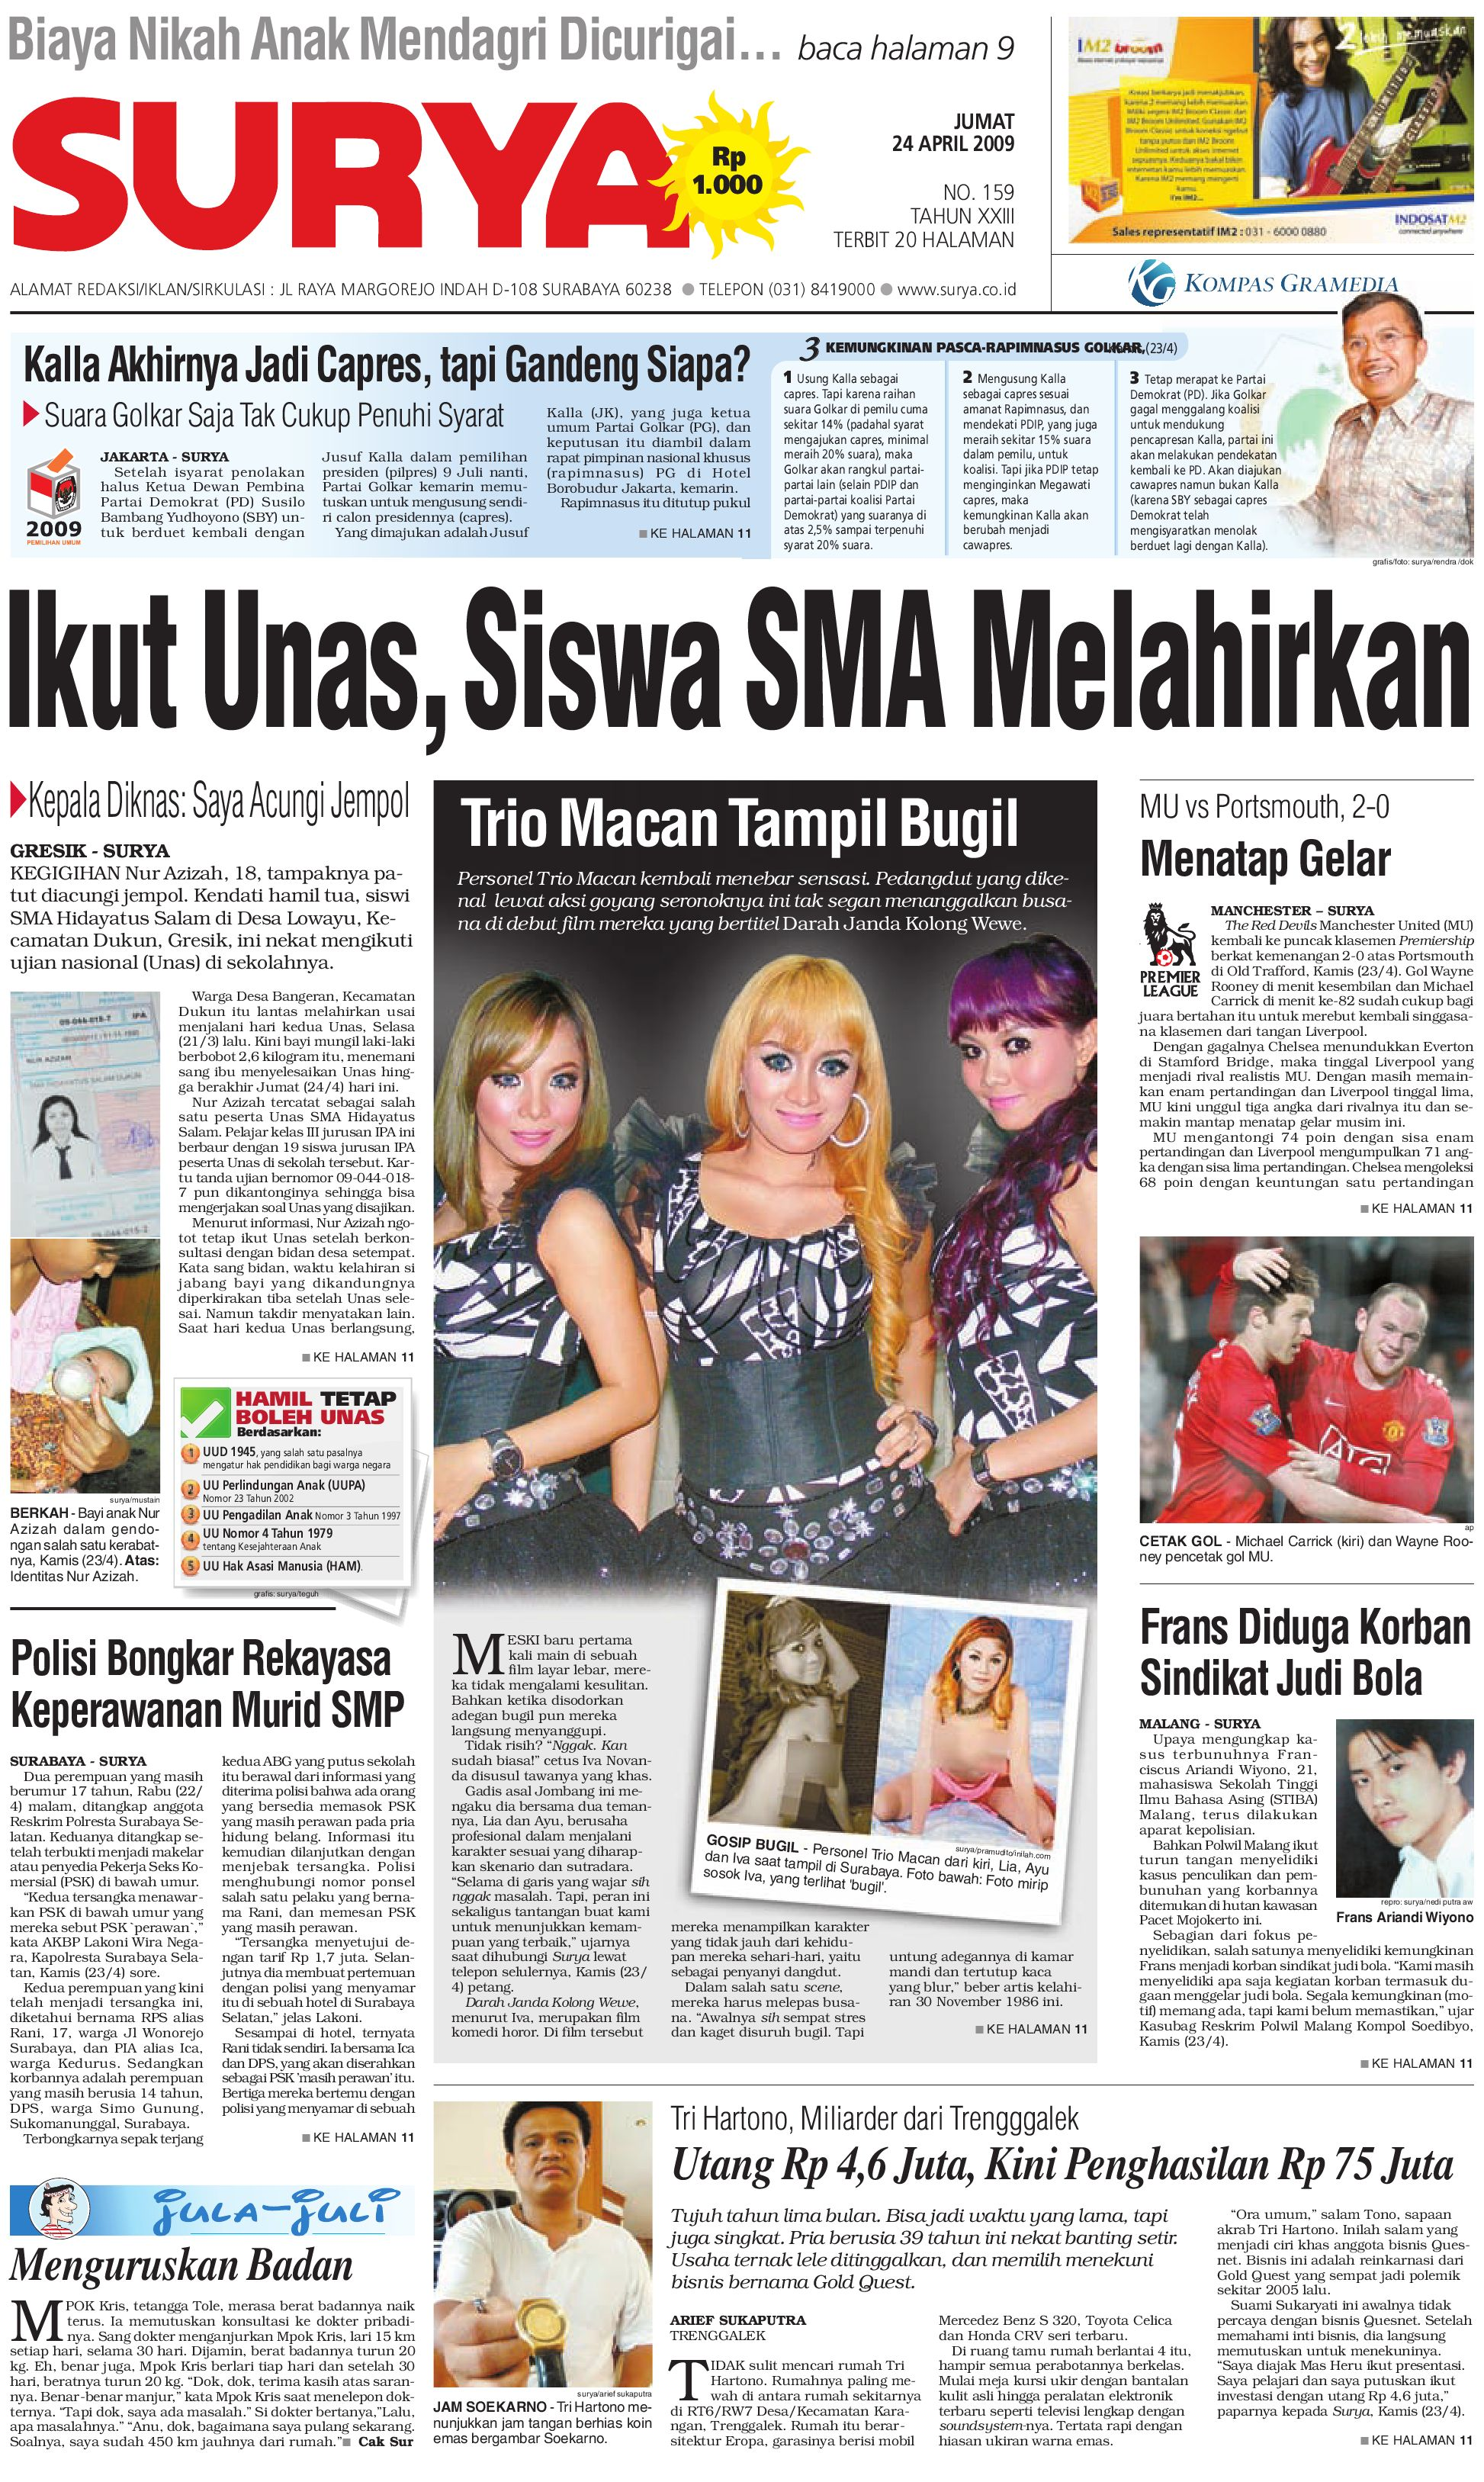 harian surya edisi cetak 24 april 2009 by harian surya issuu